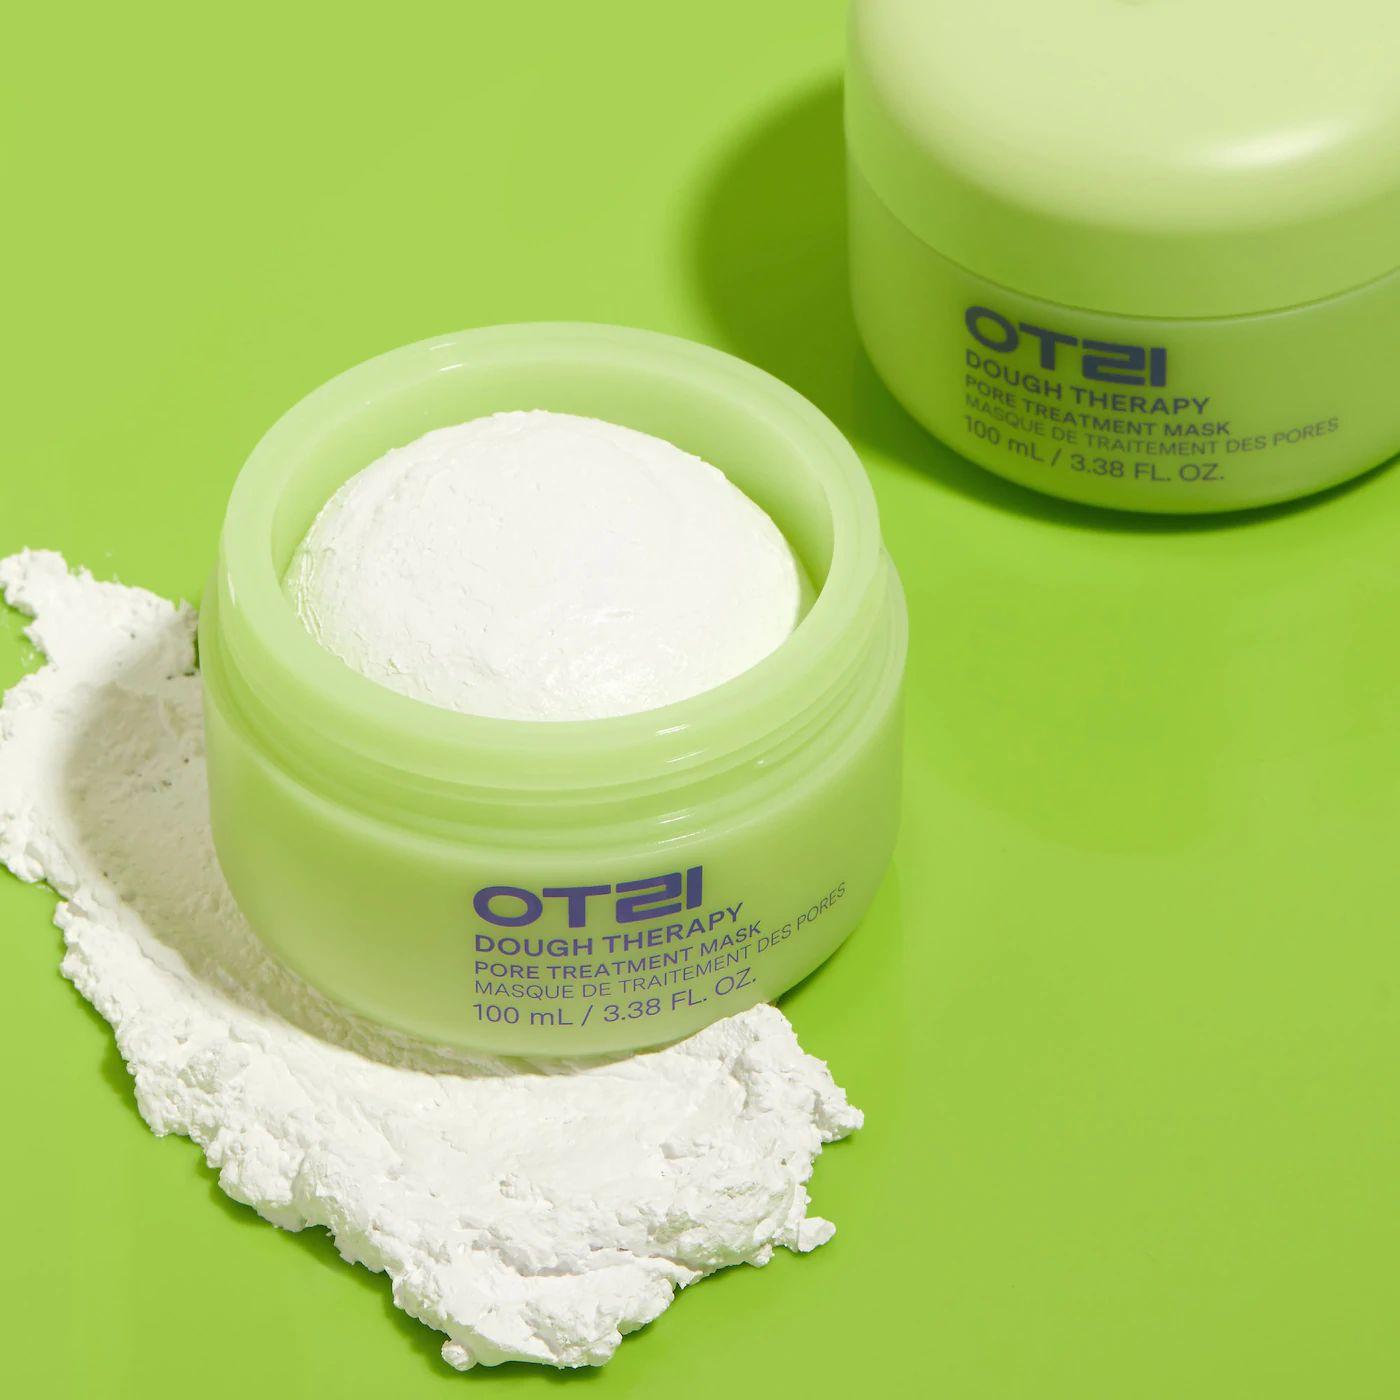 Otzi Dough Therapy Skincare Mask Review